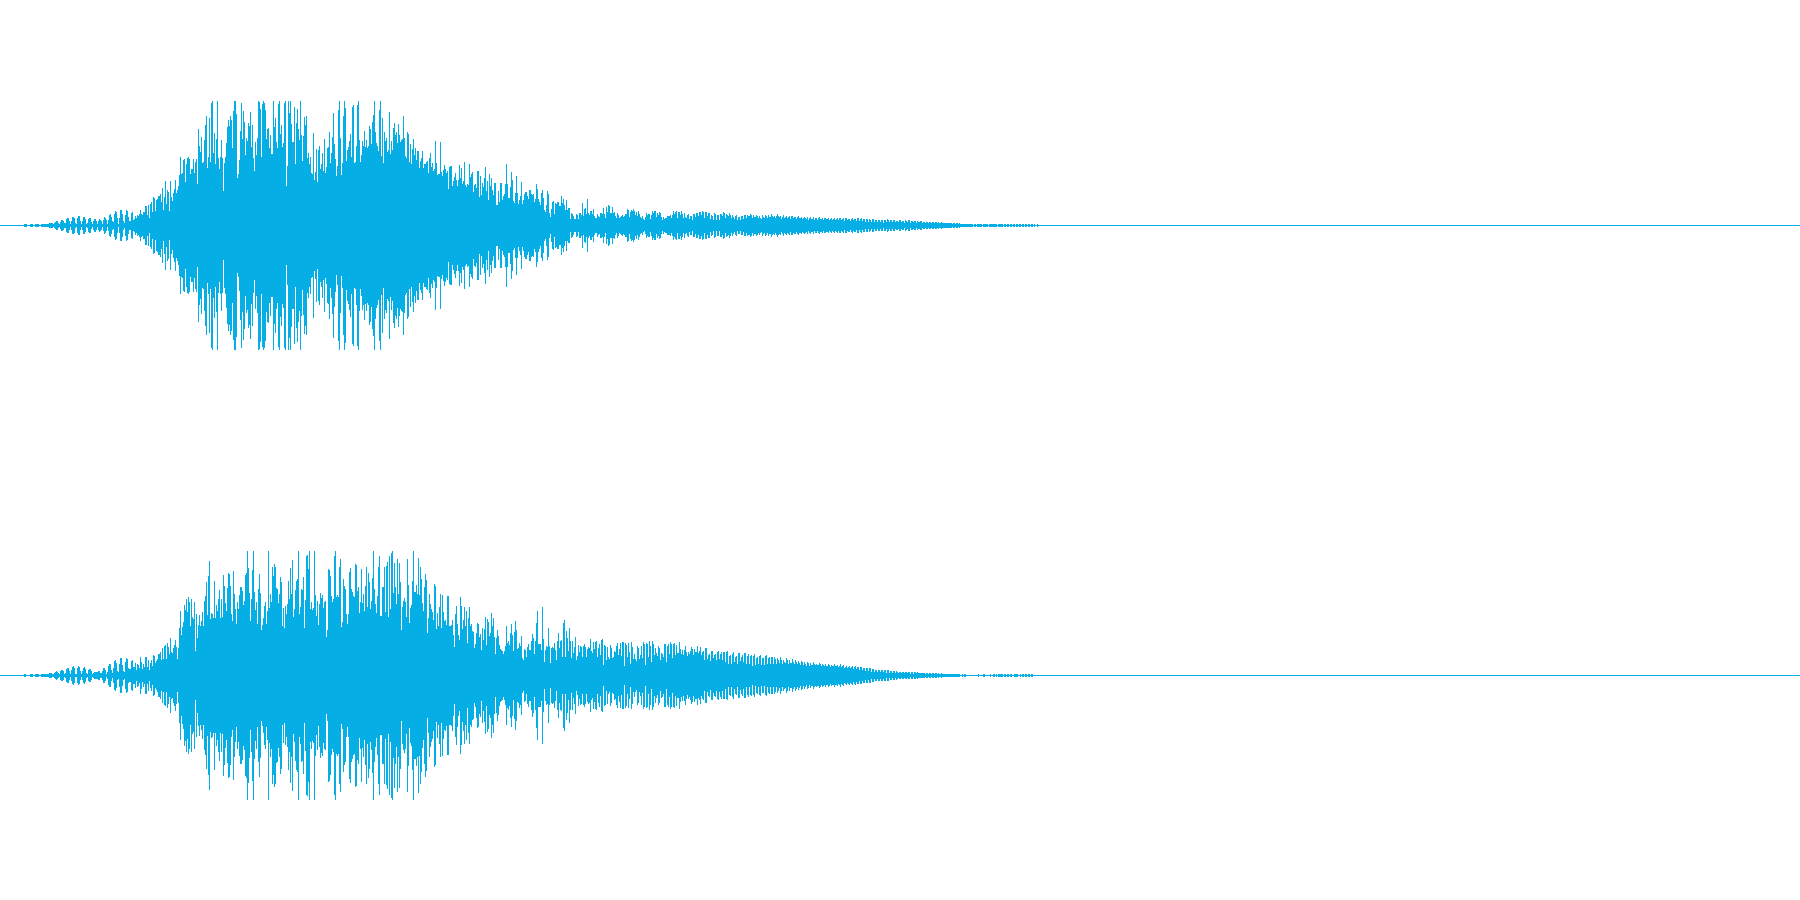 SFの開閉音や小規模ワープ風の再生済みの波形